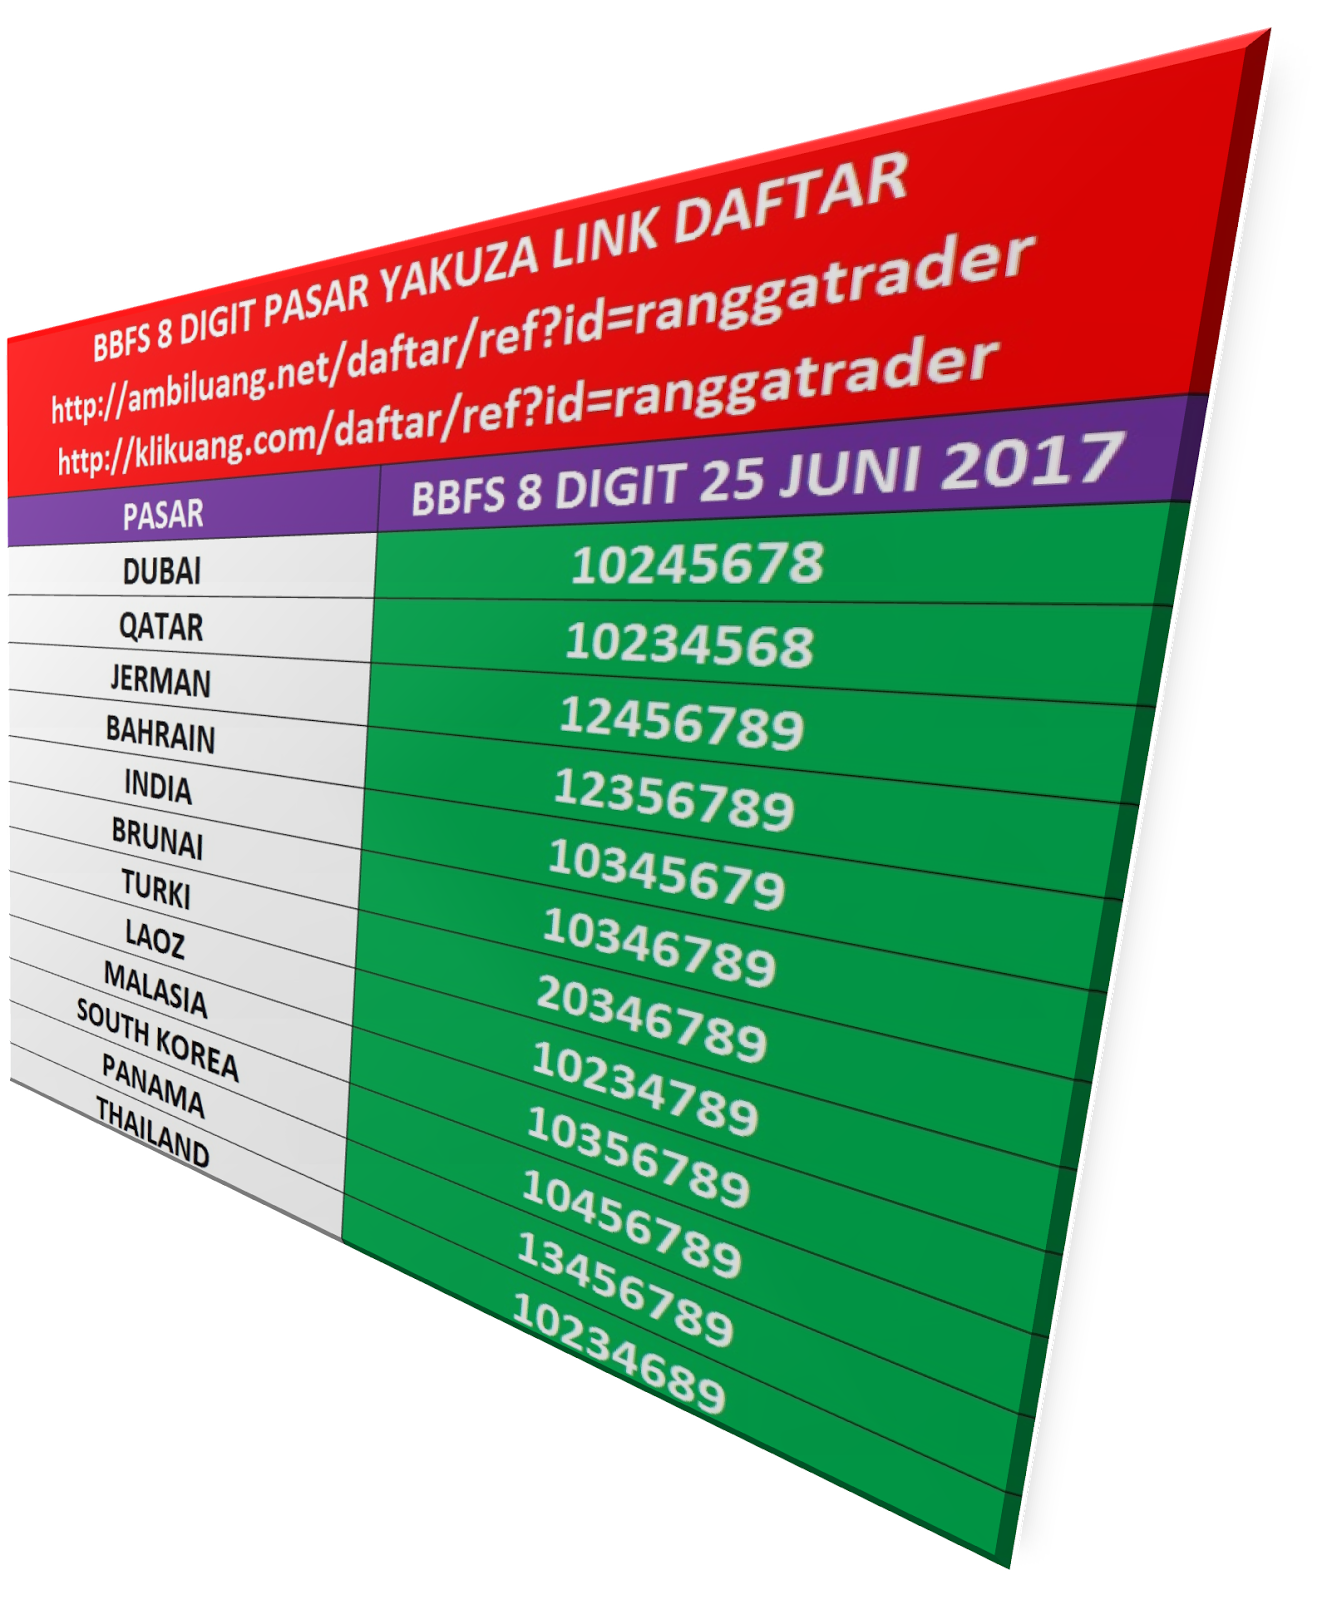 BBFS 8 DIGIT 12 PASAR DUBAI   SAMPAI THAILAND,,25 JUNI 2017